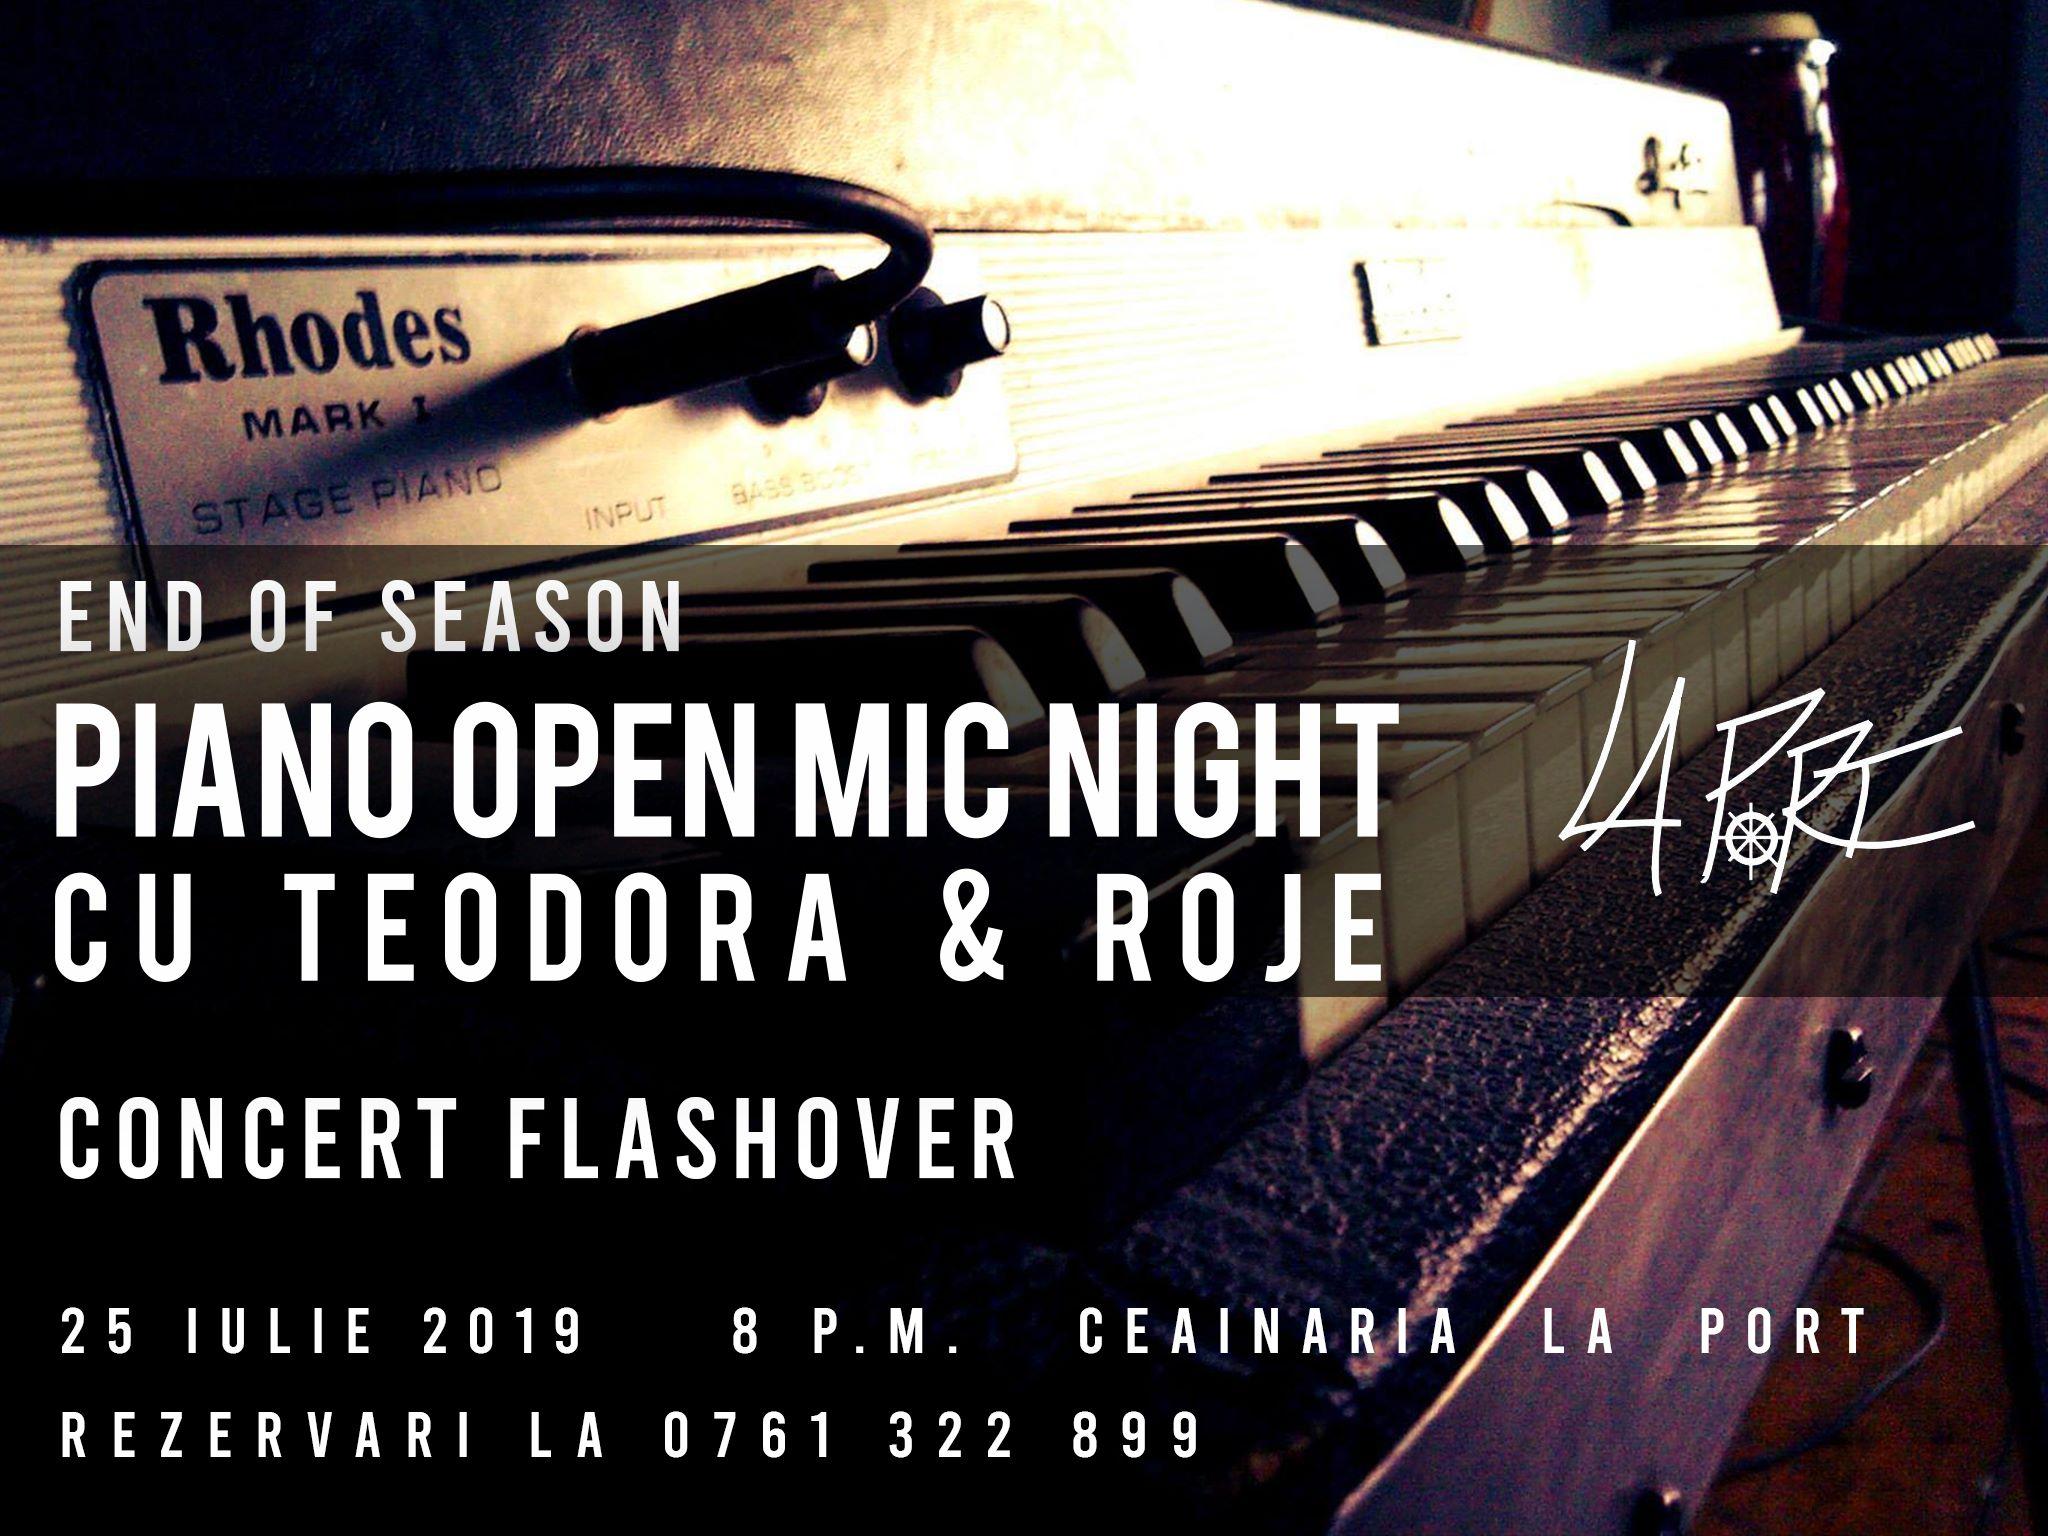 Piano Open Mic Night (end of season)   Flashover